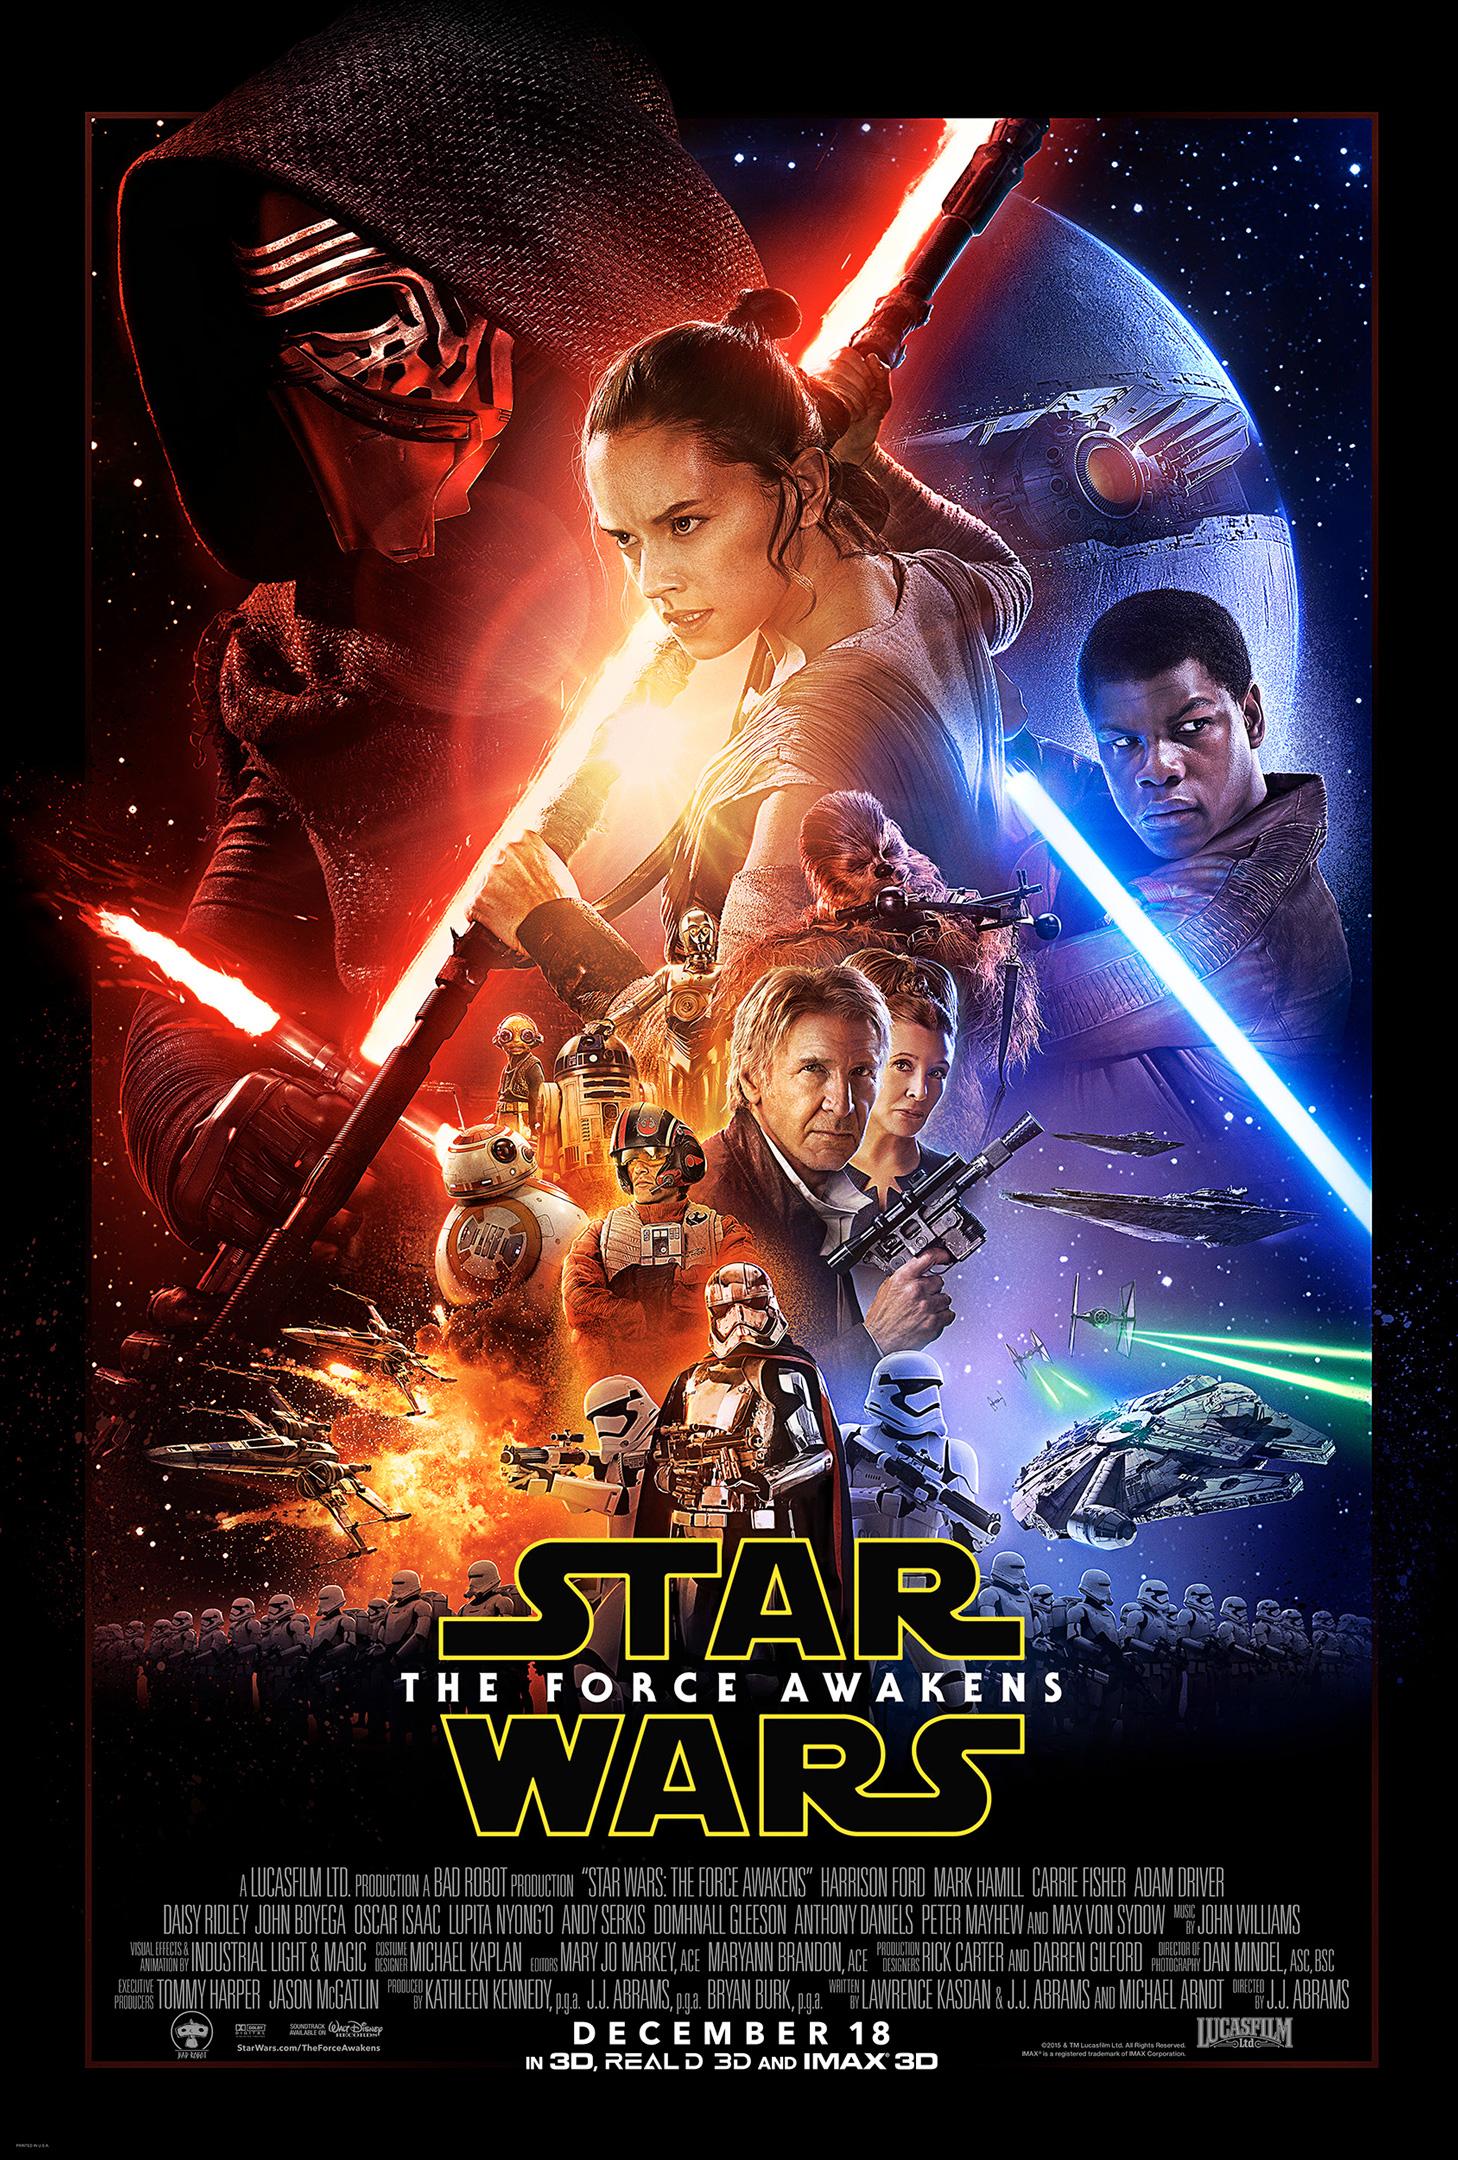 star wars force awakens poster spoiler alert